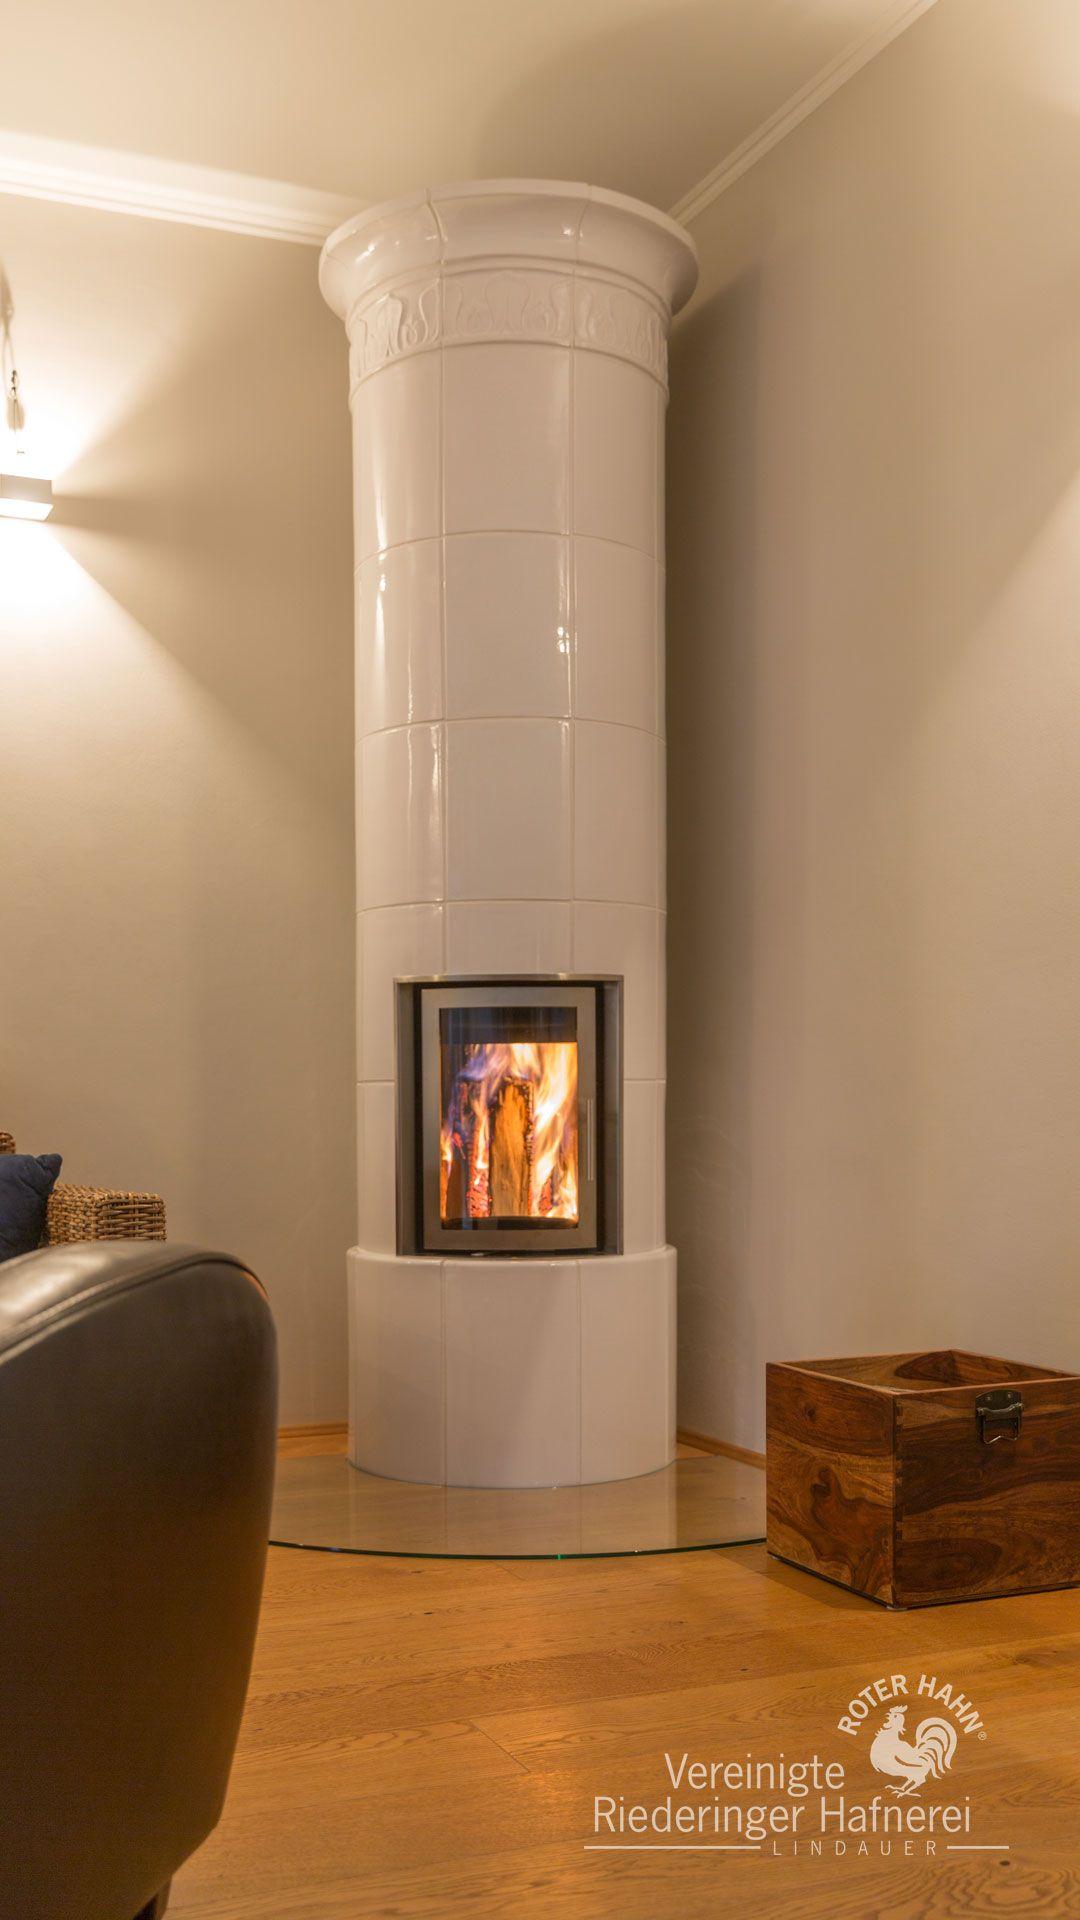 Riederinger Hafnerei stilkamin vereinigte riederinger hafnerei fireplaces